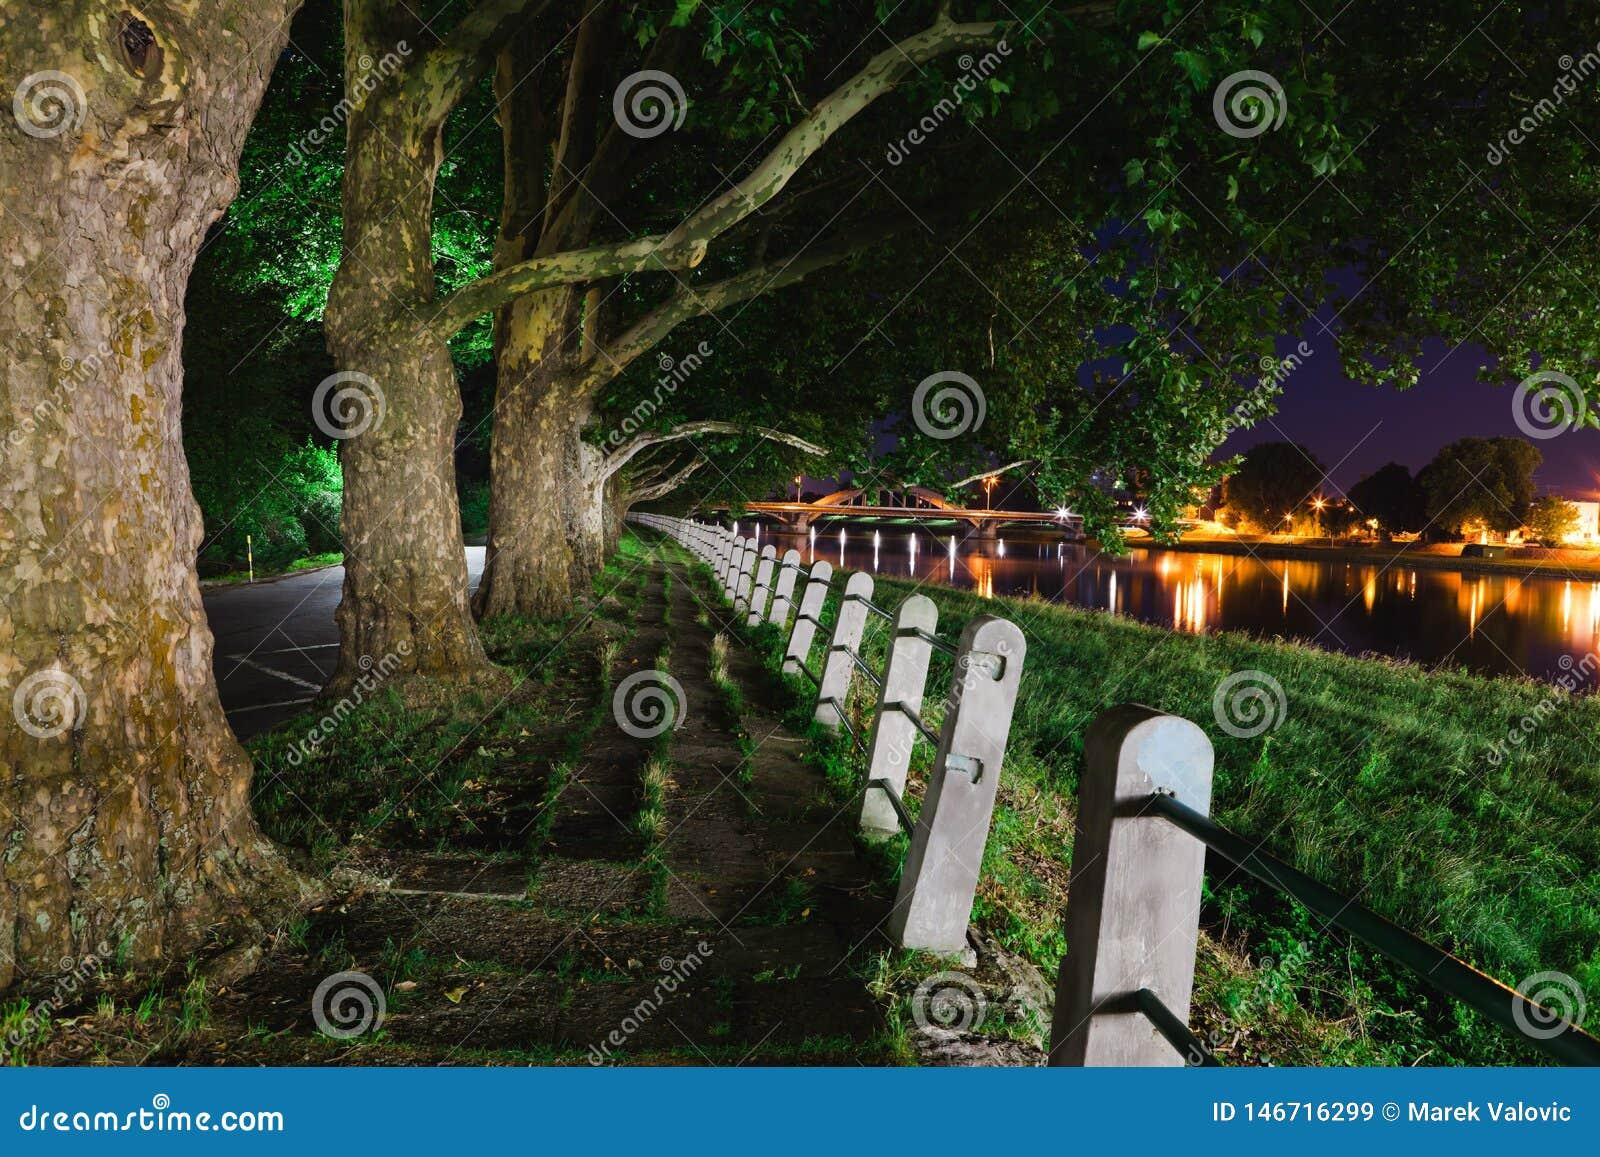 Night scene of abandoned side walk near river